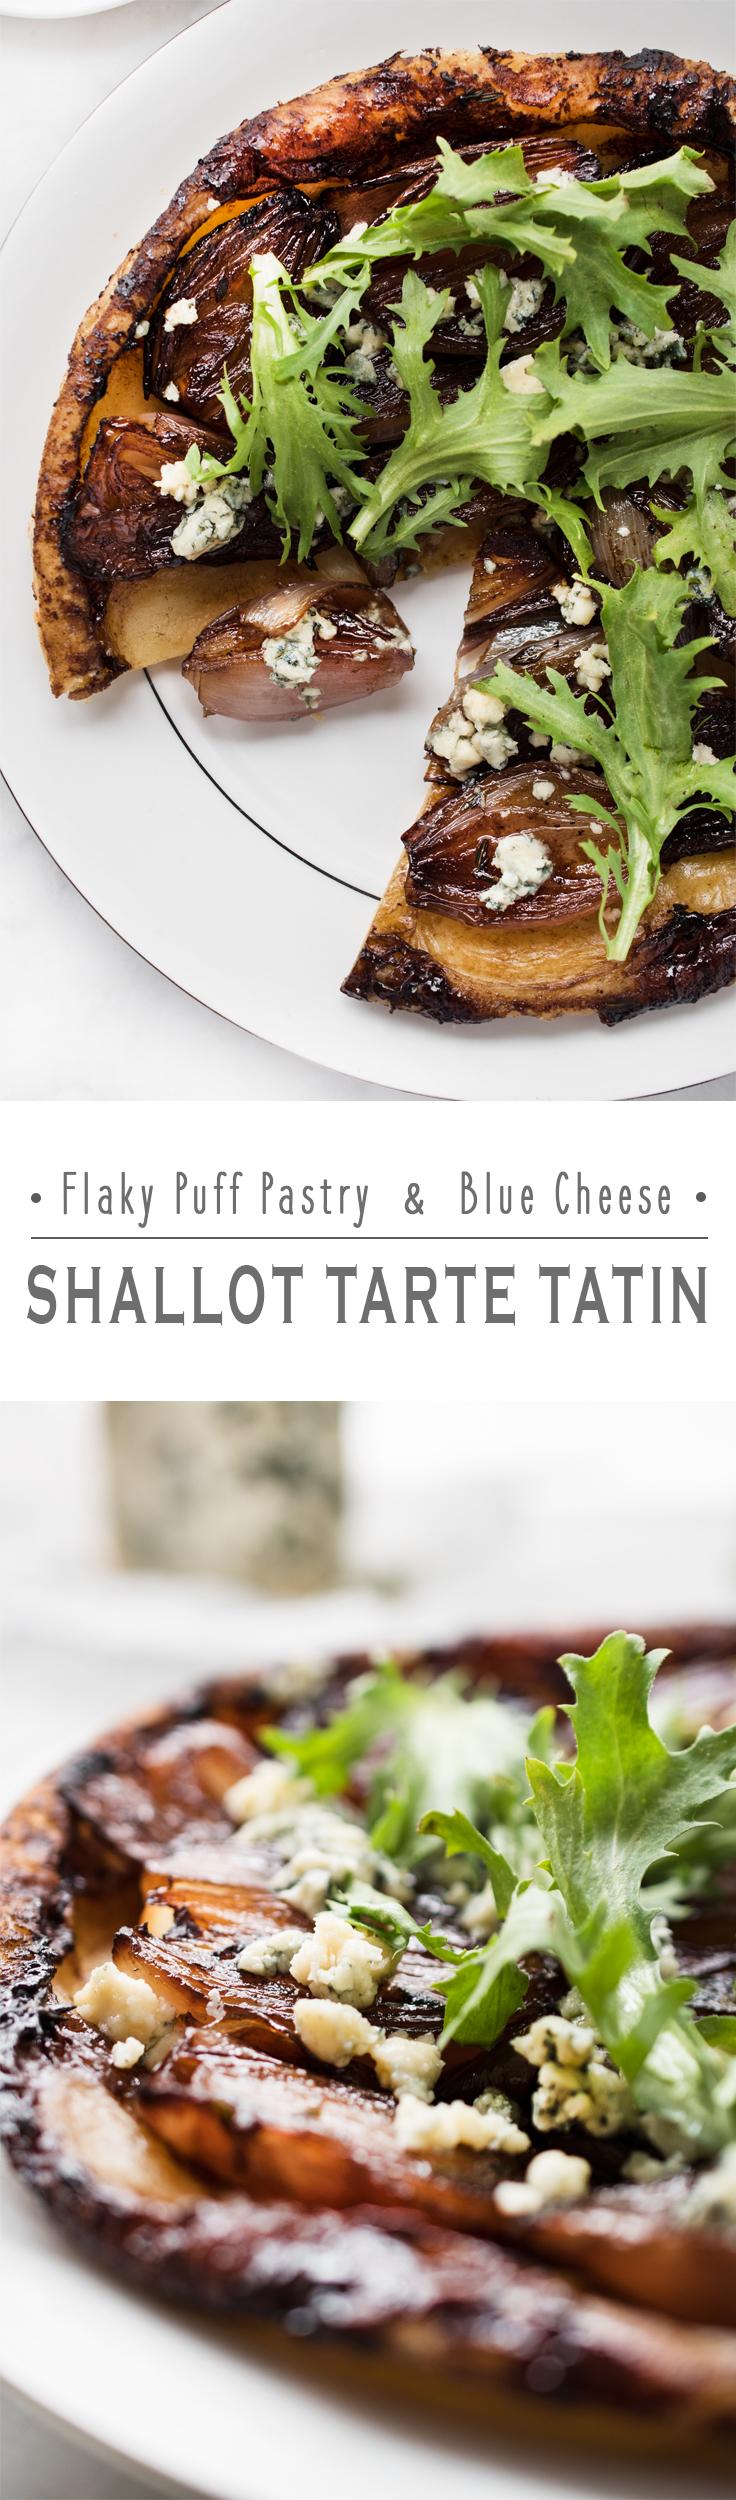 Flaky Puff Pastry and Blue Cheese - Shallot Tarte Tatin